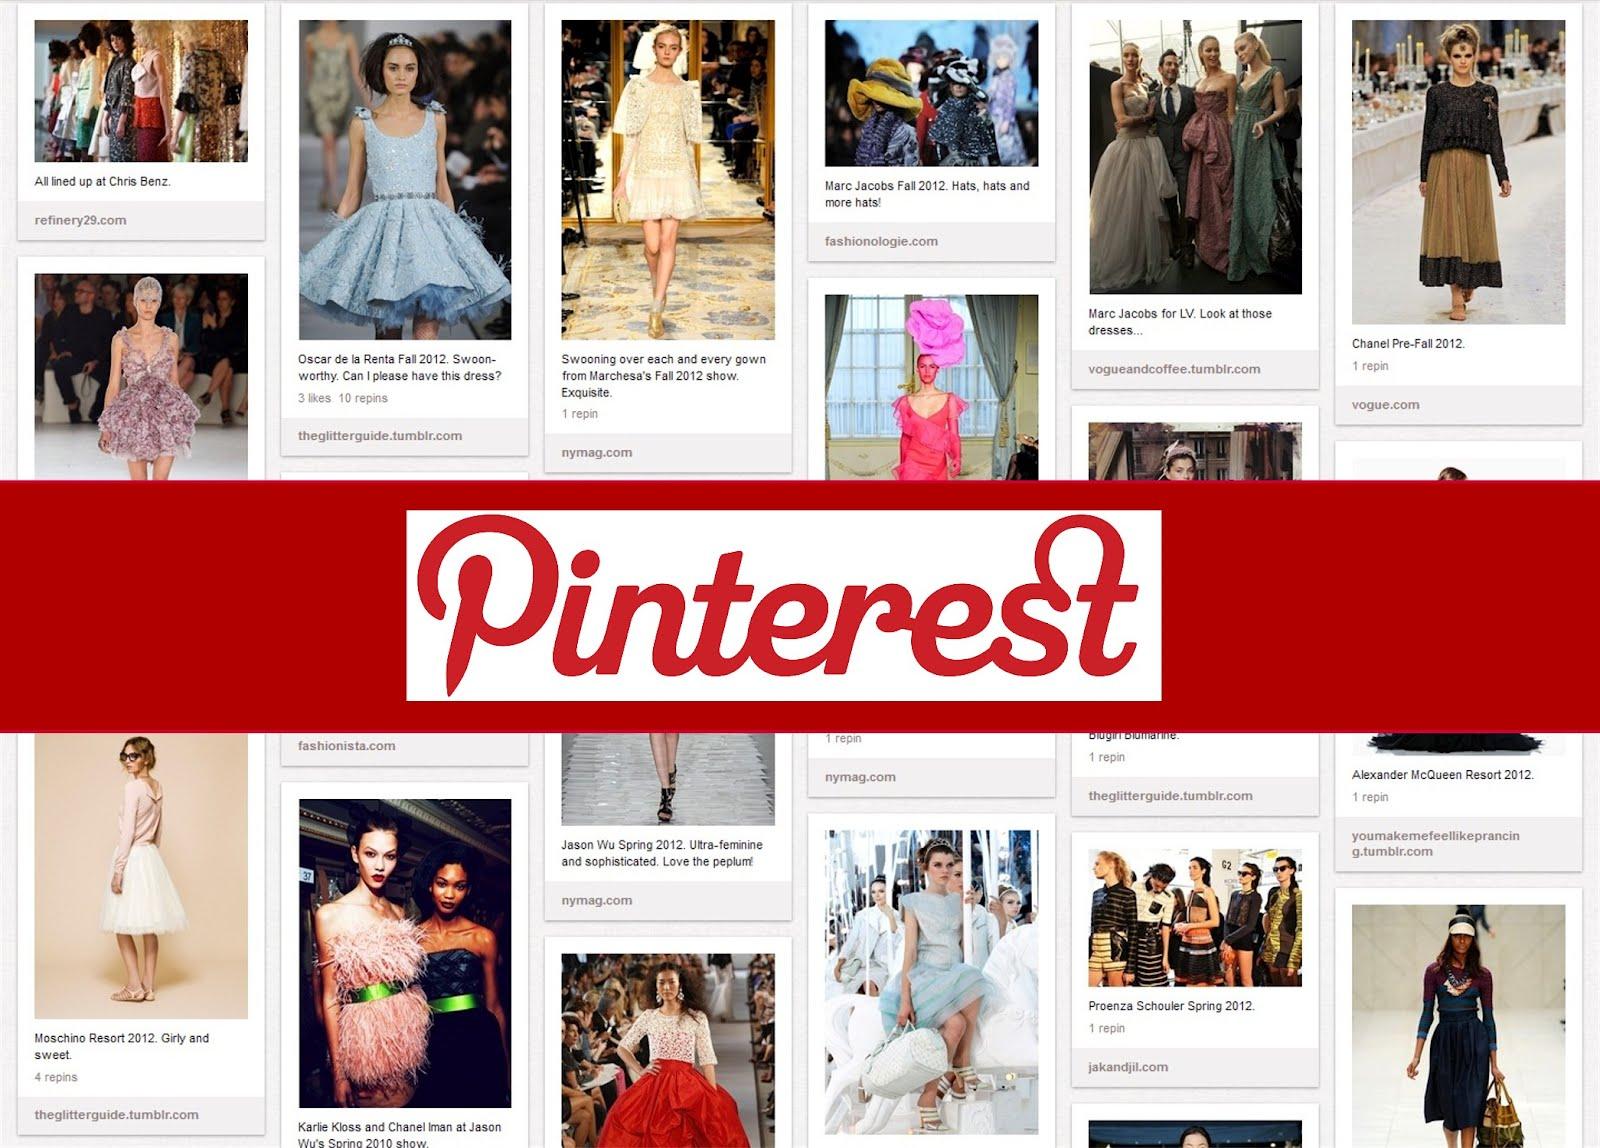 10 trucos para usar mejor Pinterest